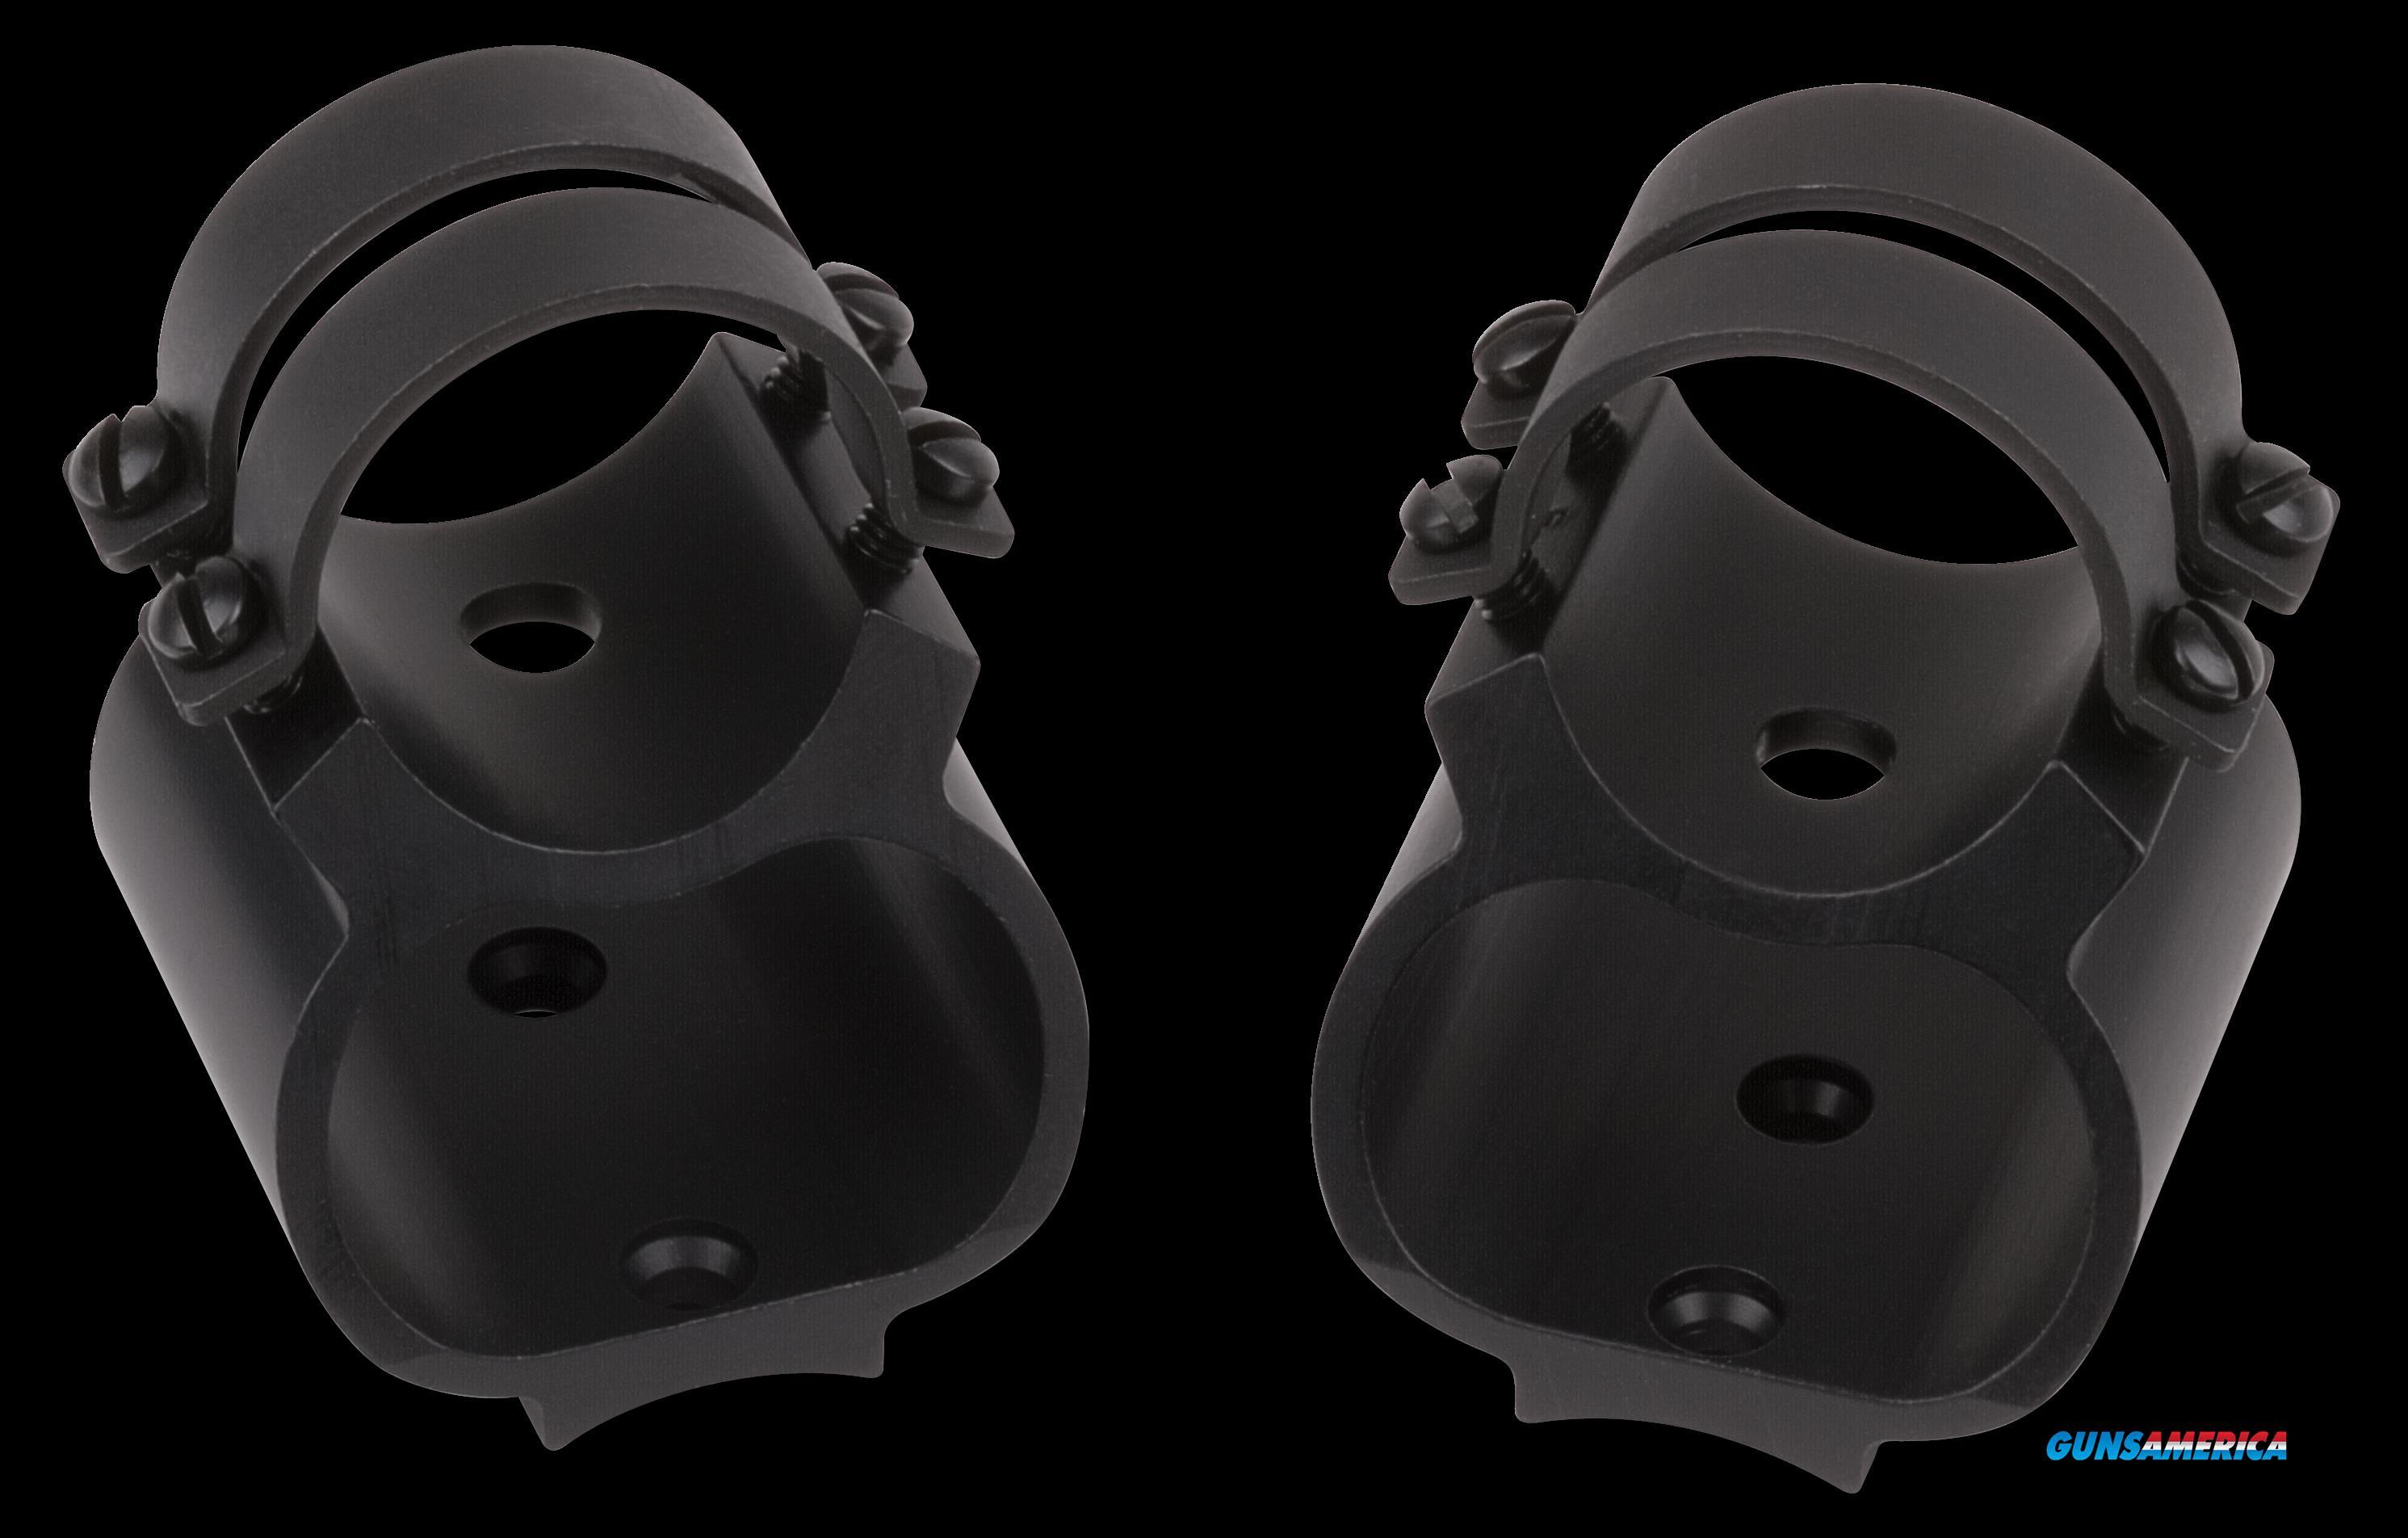 Weaver Mounts Steel Lock, Weav 49715 See Thru Mnt R742-760-740  Guns > Pistols > 1911 Pistol Copies (non-Colt)